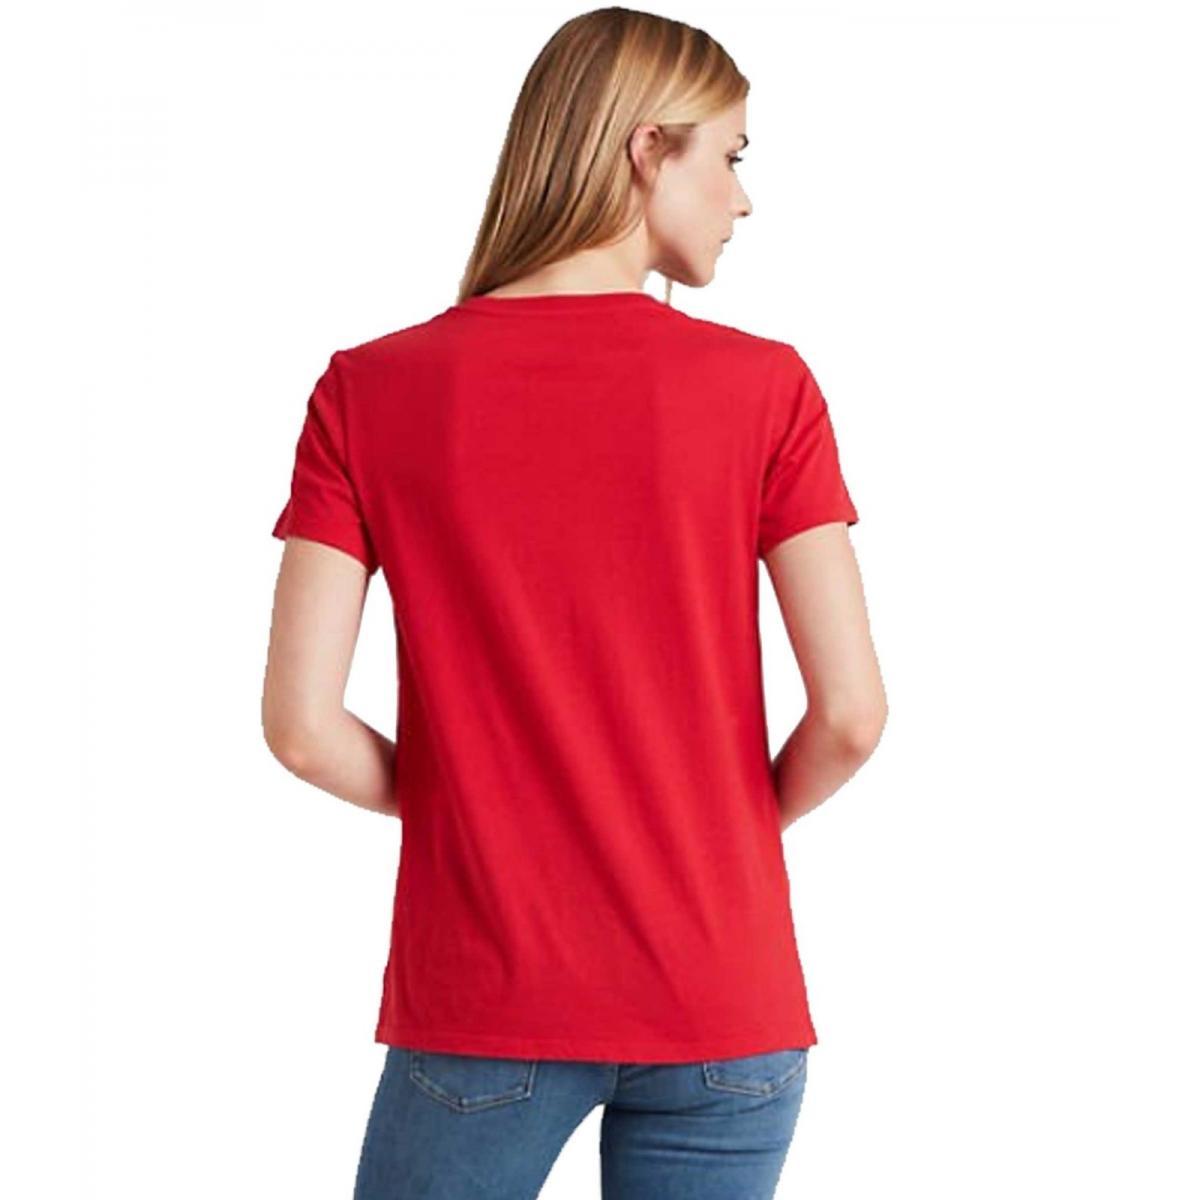 T-shirt Levi's The Perfect Tee da donna rif. 17369-0408